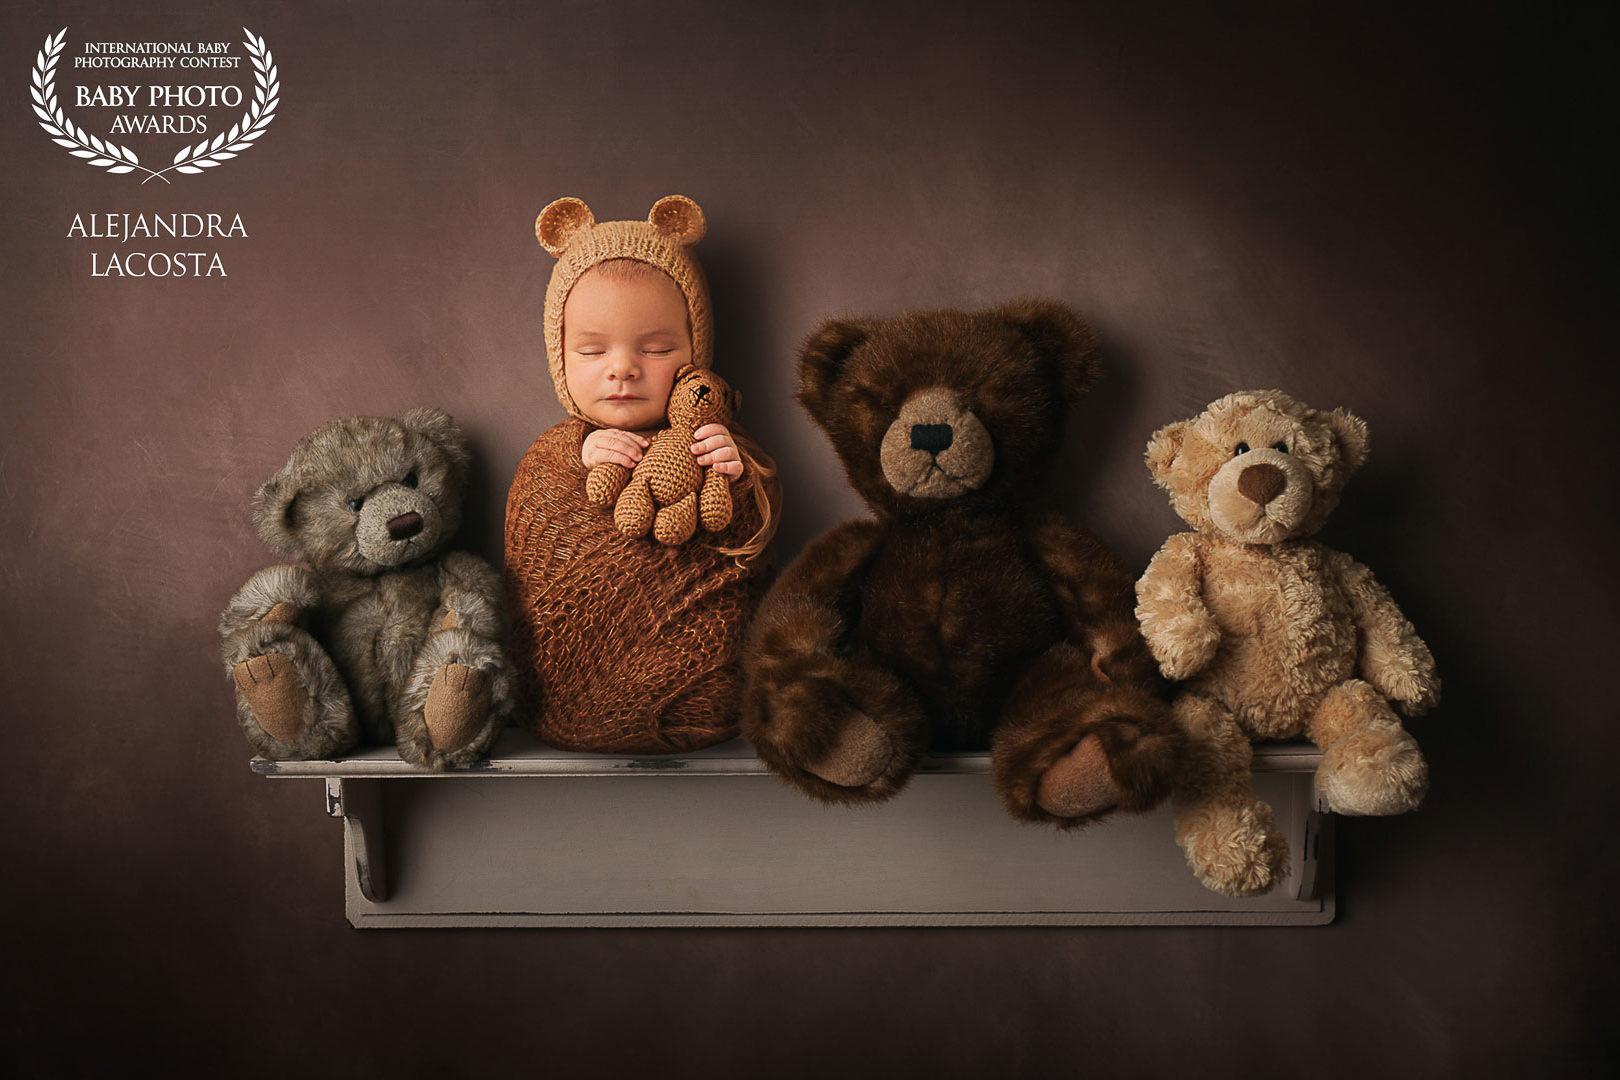 premio-babyphotoawards-roberto-montorio-alejandra-lacosta-fotografia-bebe-recien-nacido-zaragoza 3